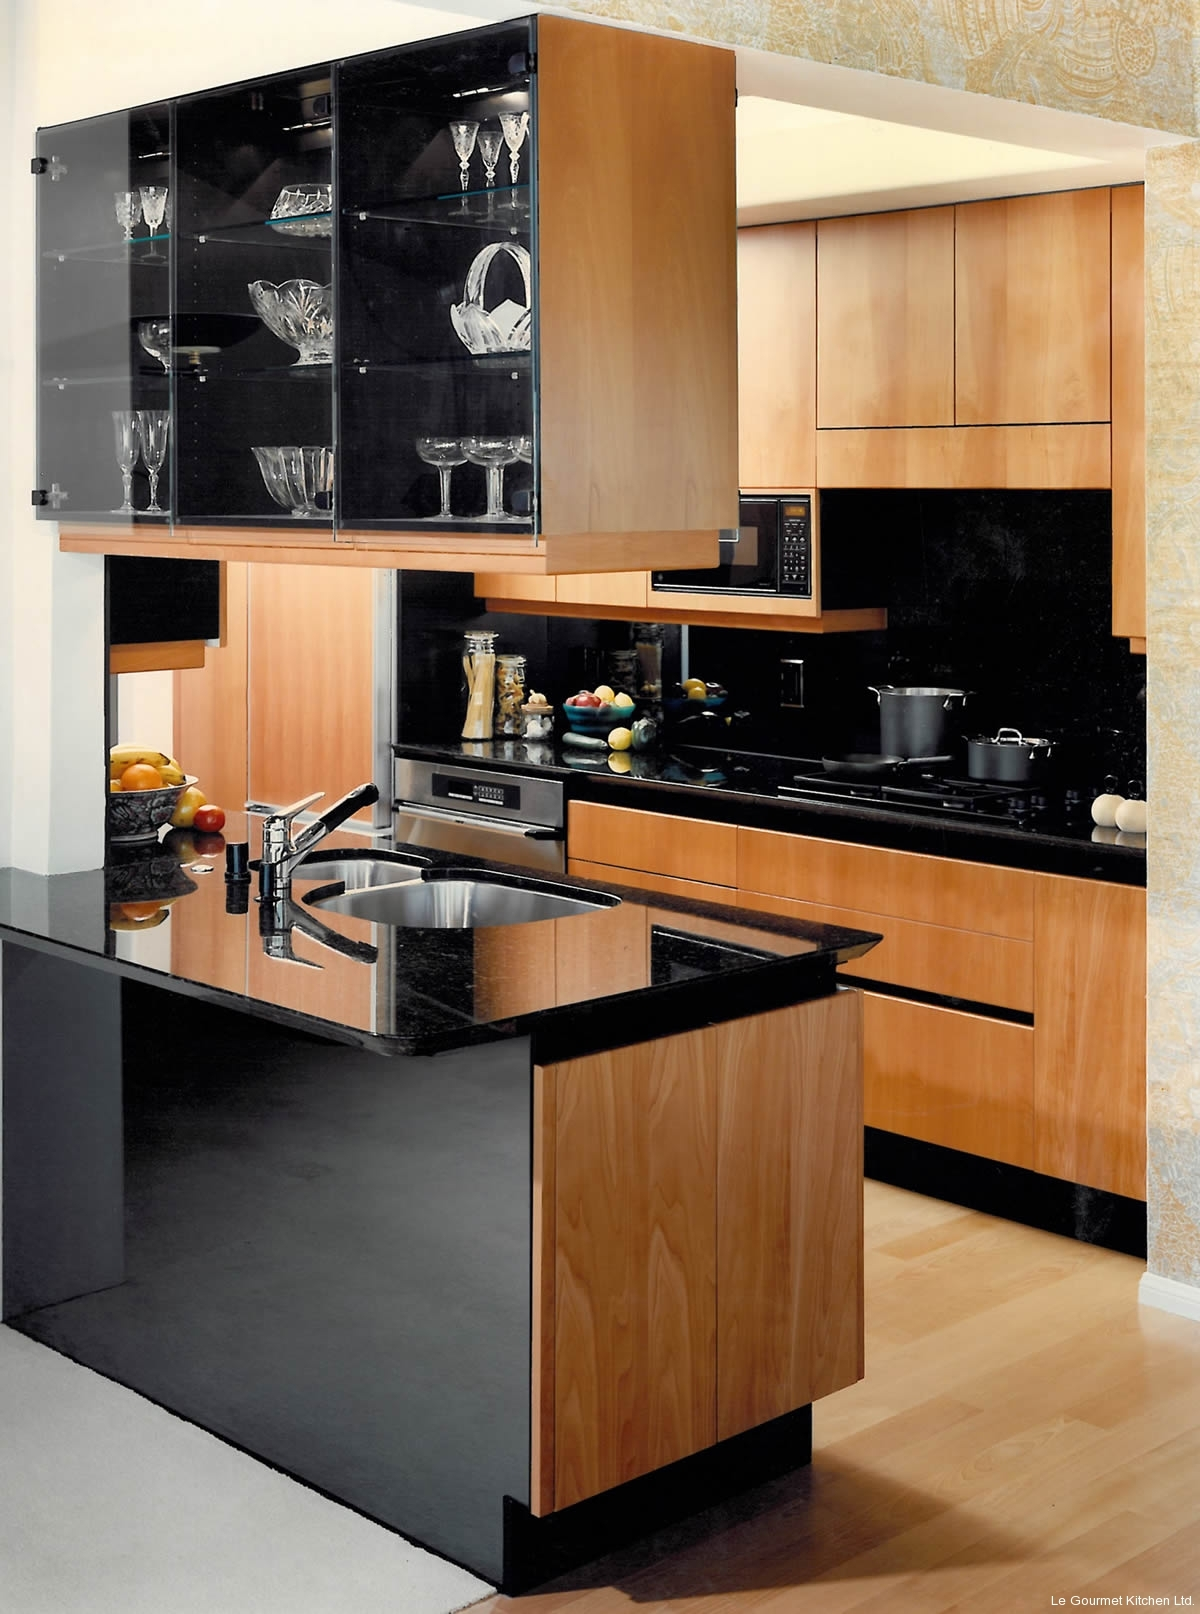 CON_Newport_Beach_Kitchen_Remodel_Le_Gourmet_Kitchen_Bruce_Colucci_G1